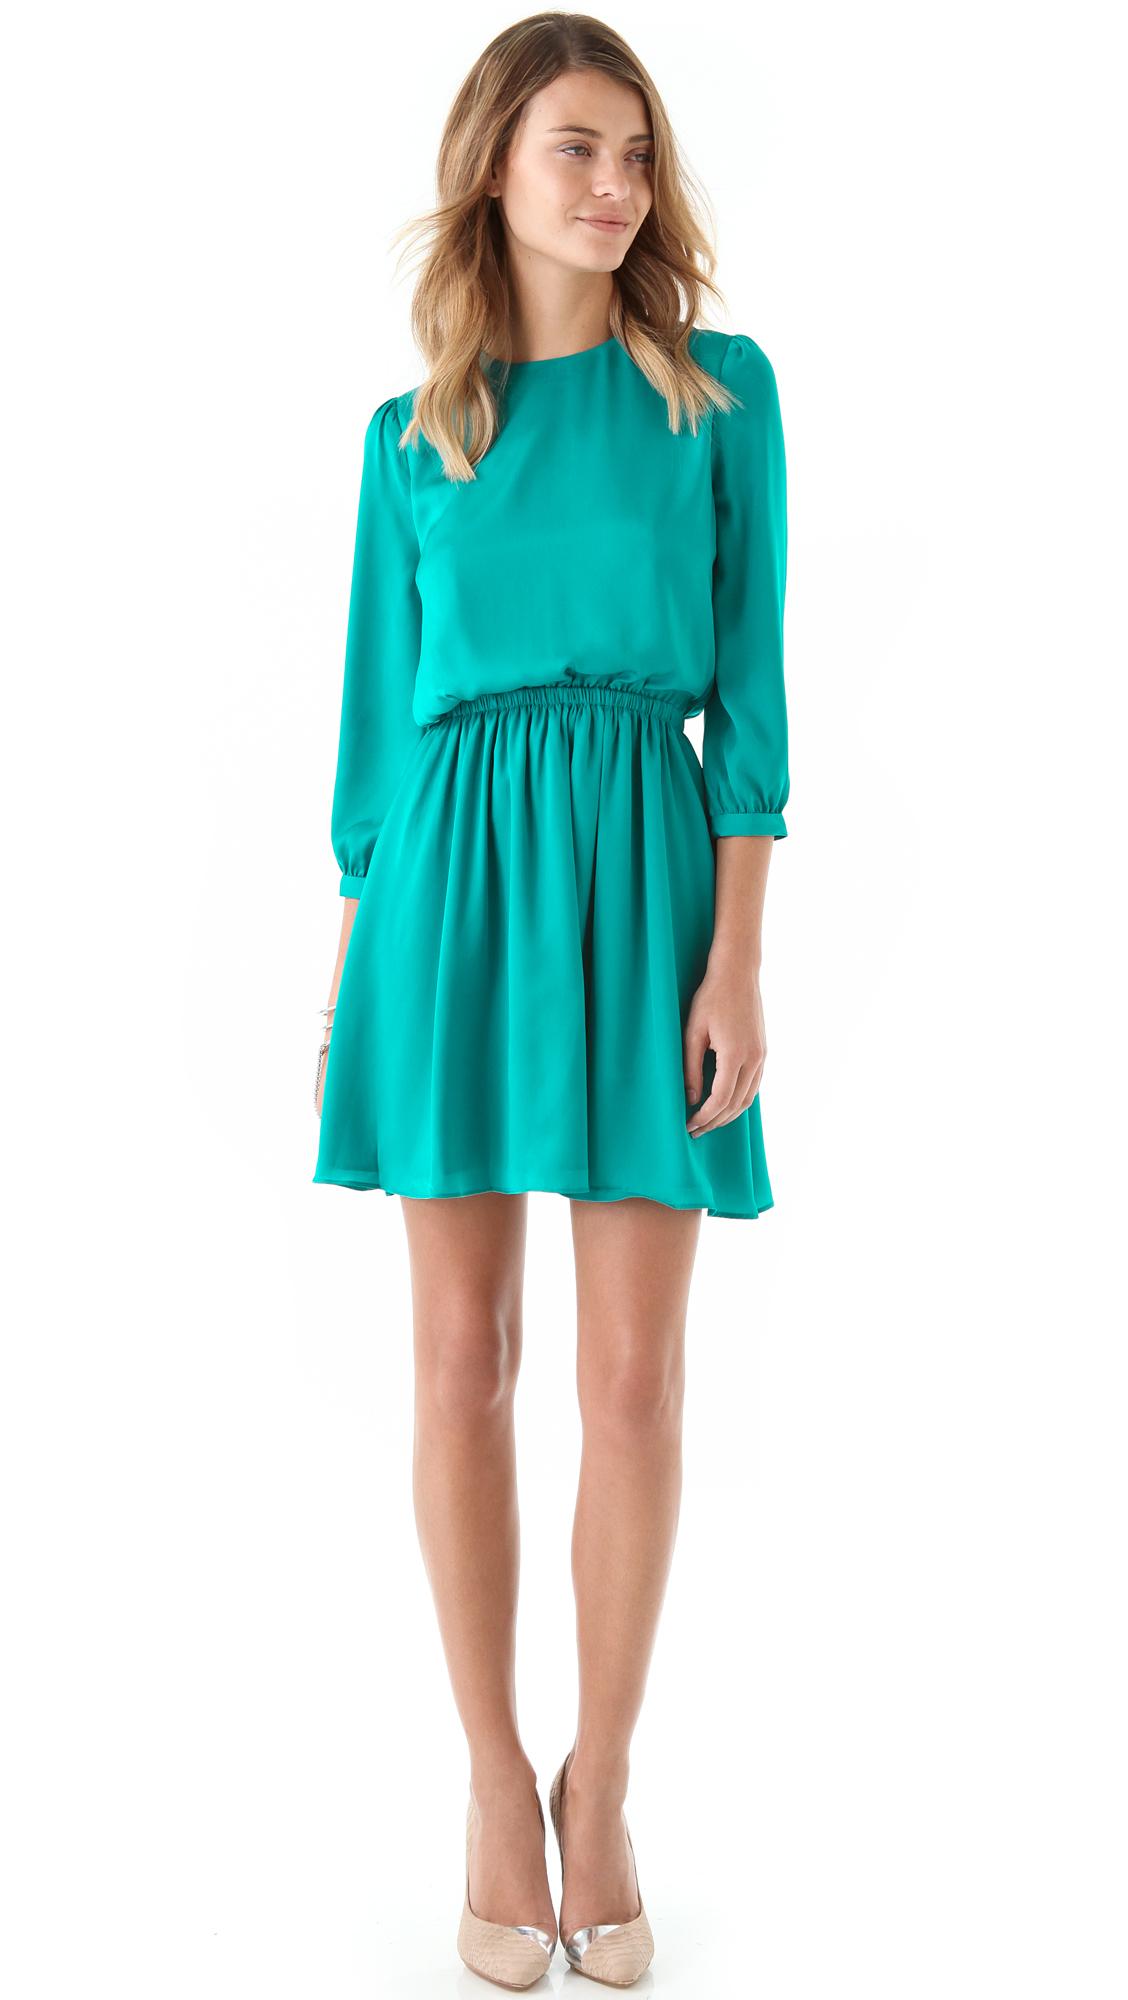 Pencey Open Back Dress In Green Aqua Lyst